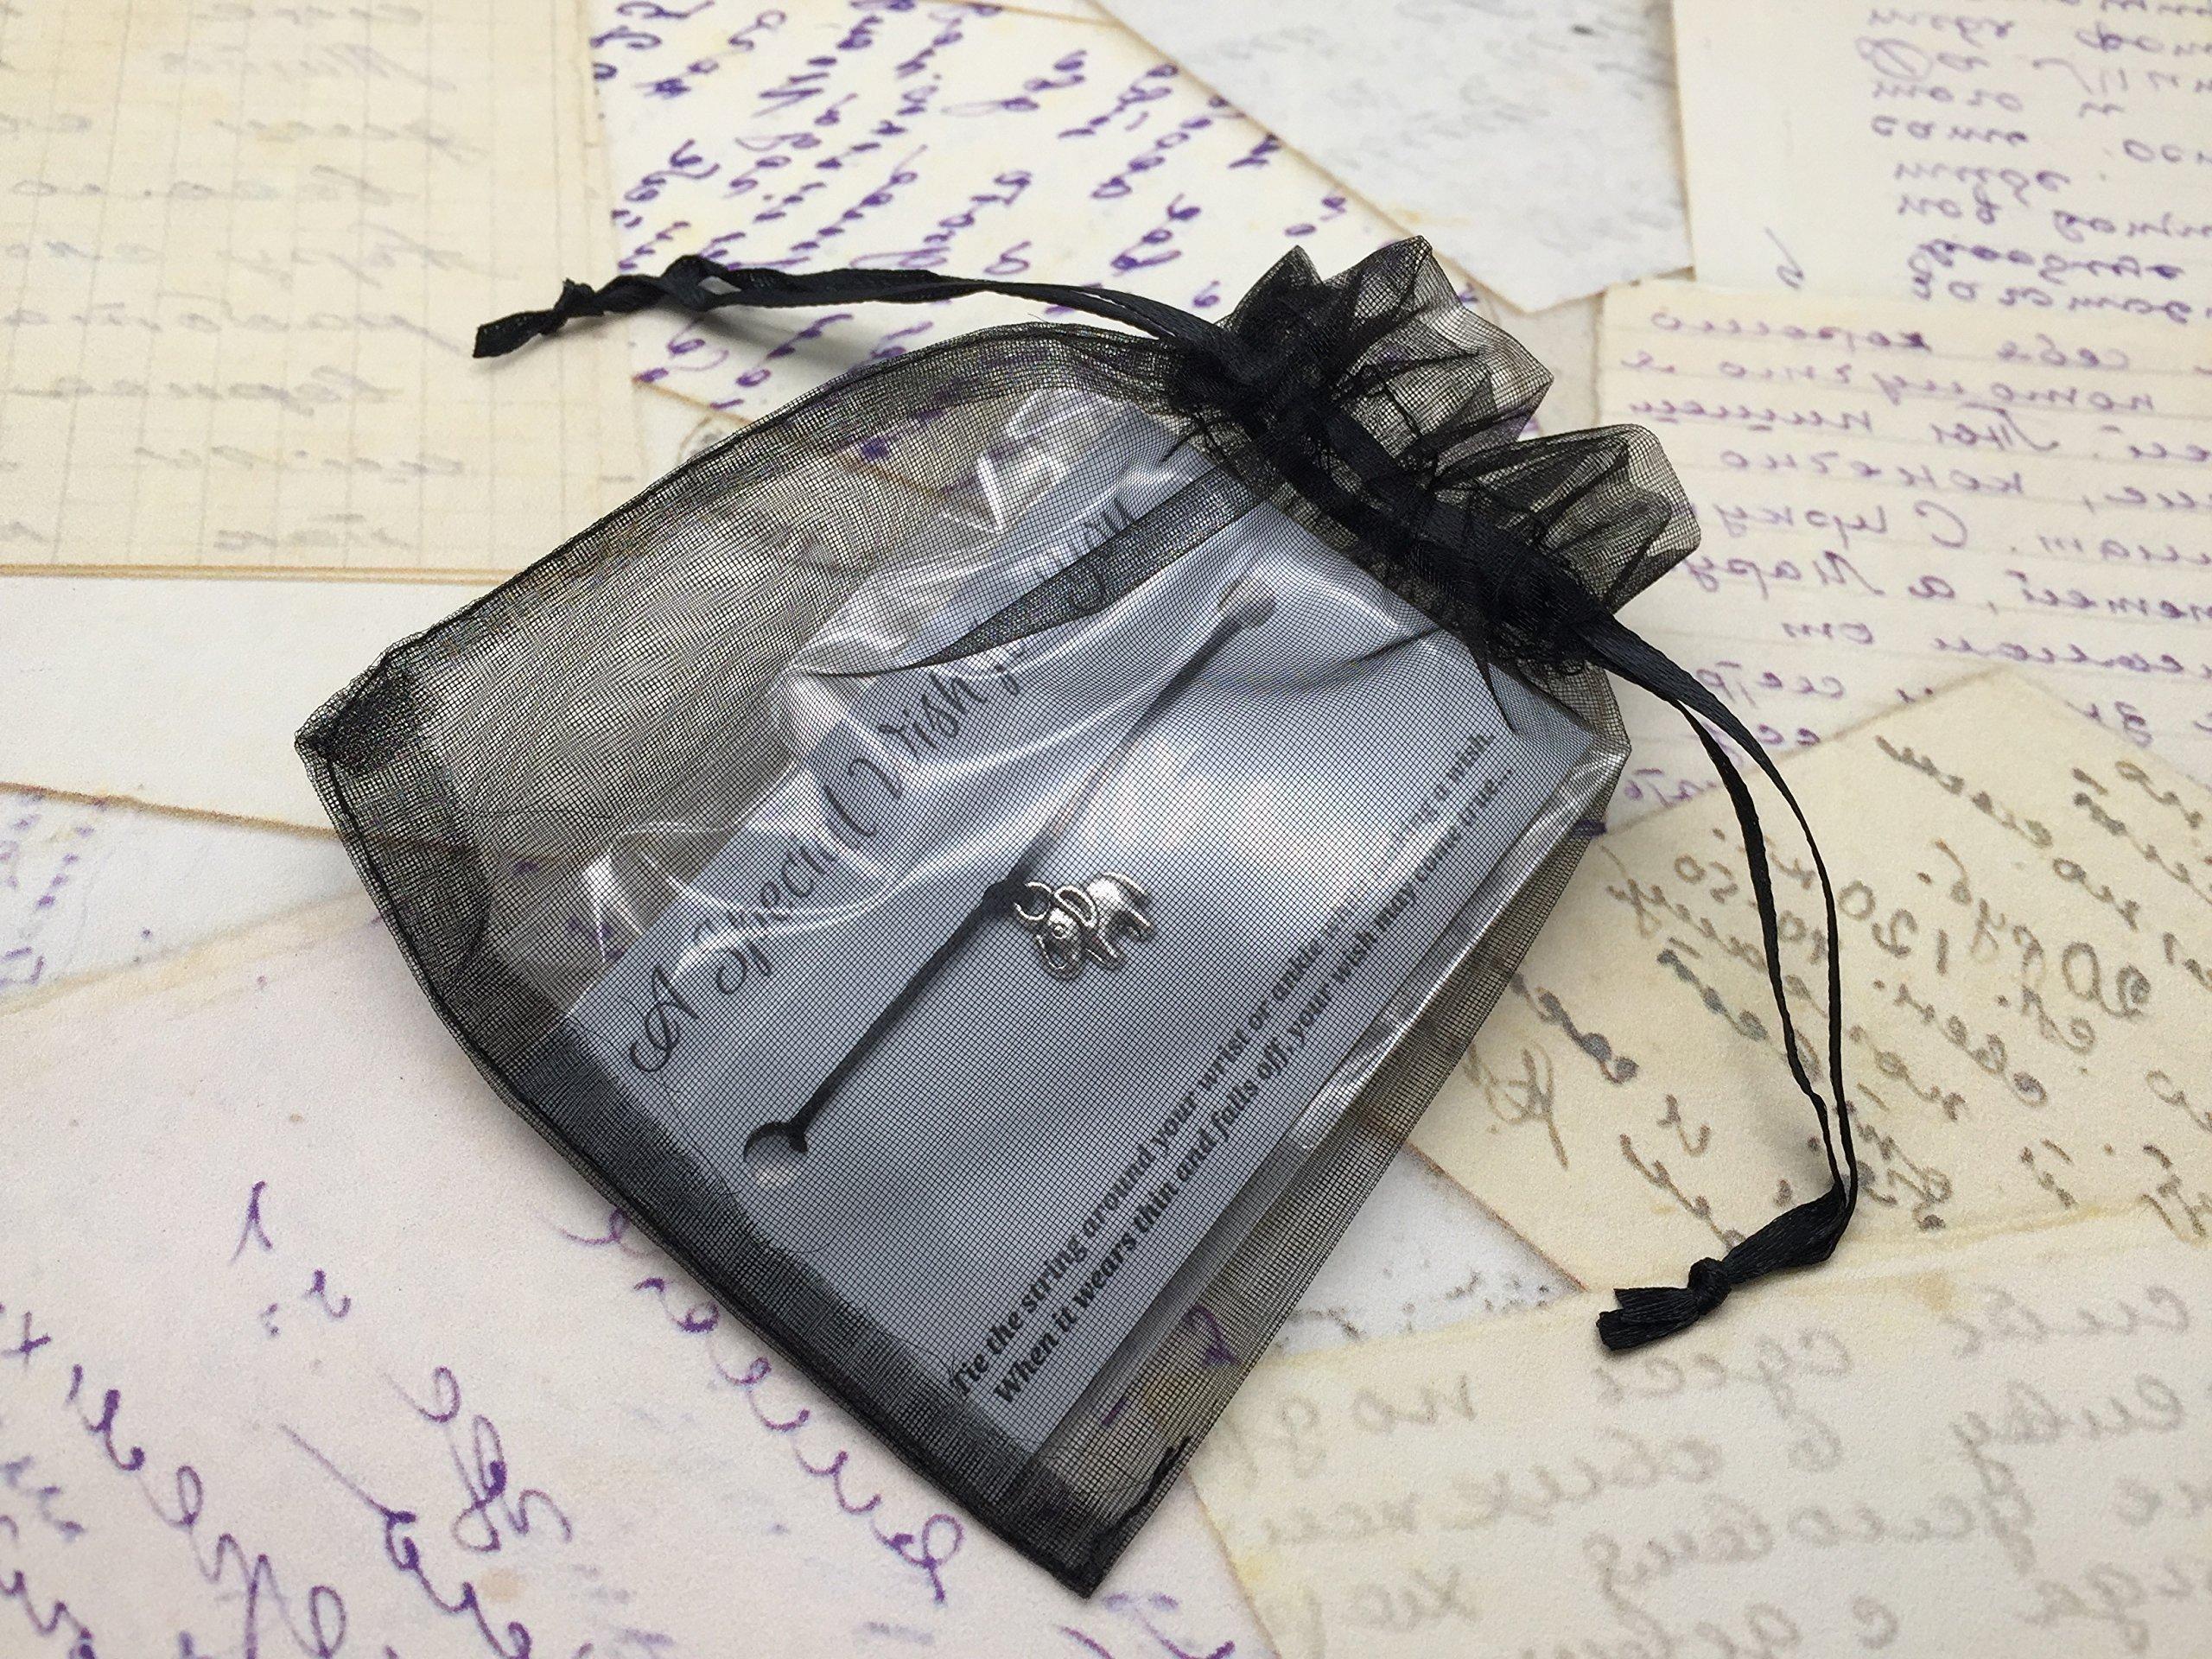 Music Note Black Wish Bracelet – Hemp with Silver Tone Charm on Printed Card – Adjustable – Unisex